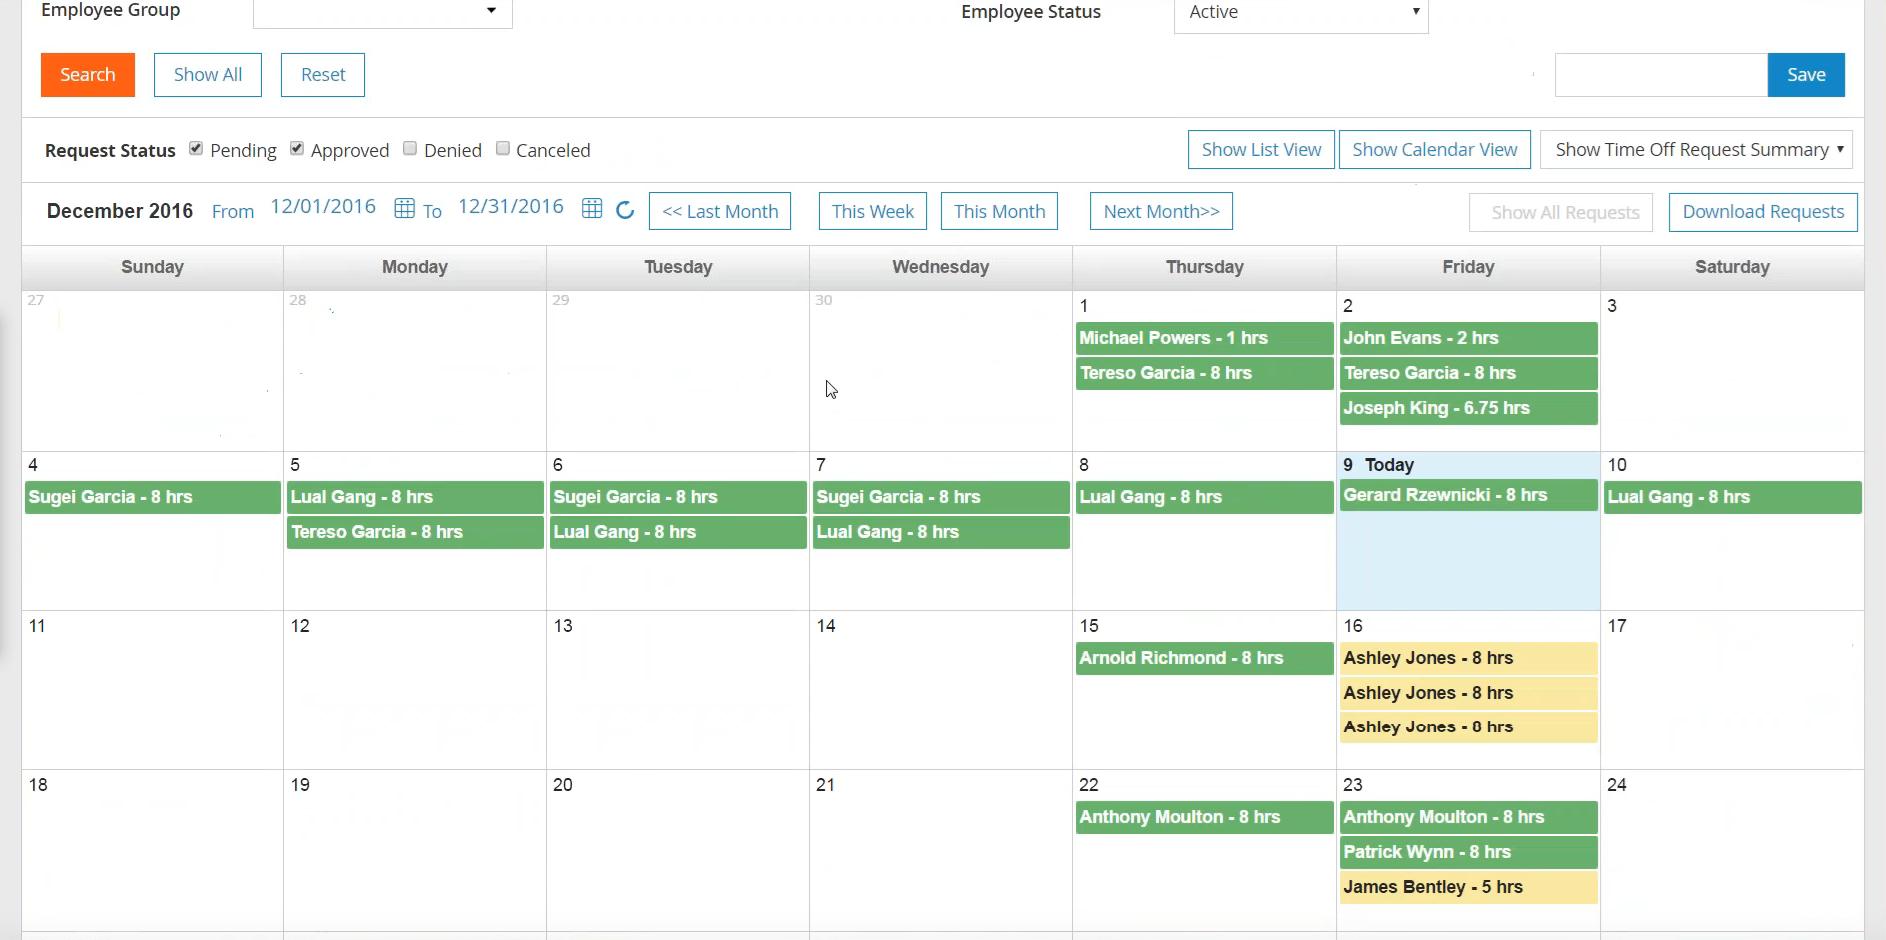 Paylocity Software - Paylocity Calendar